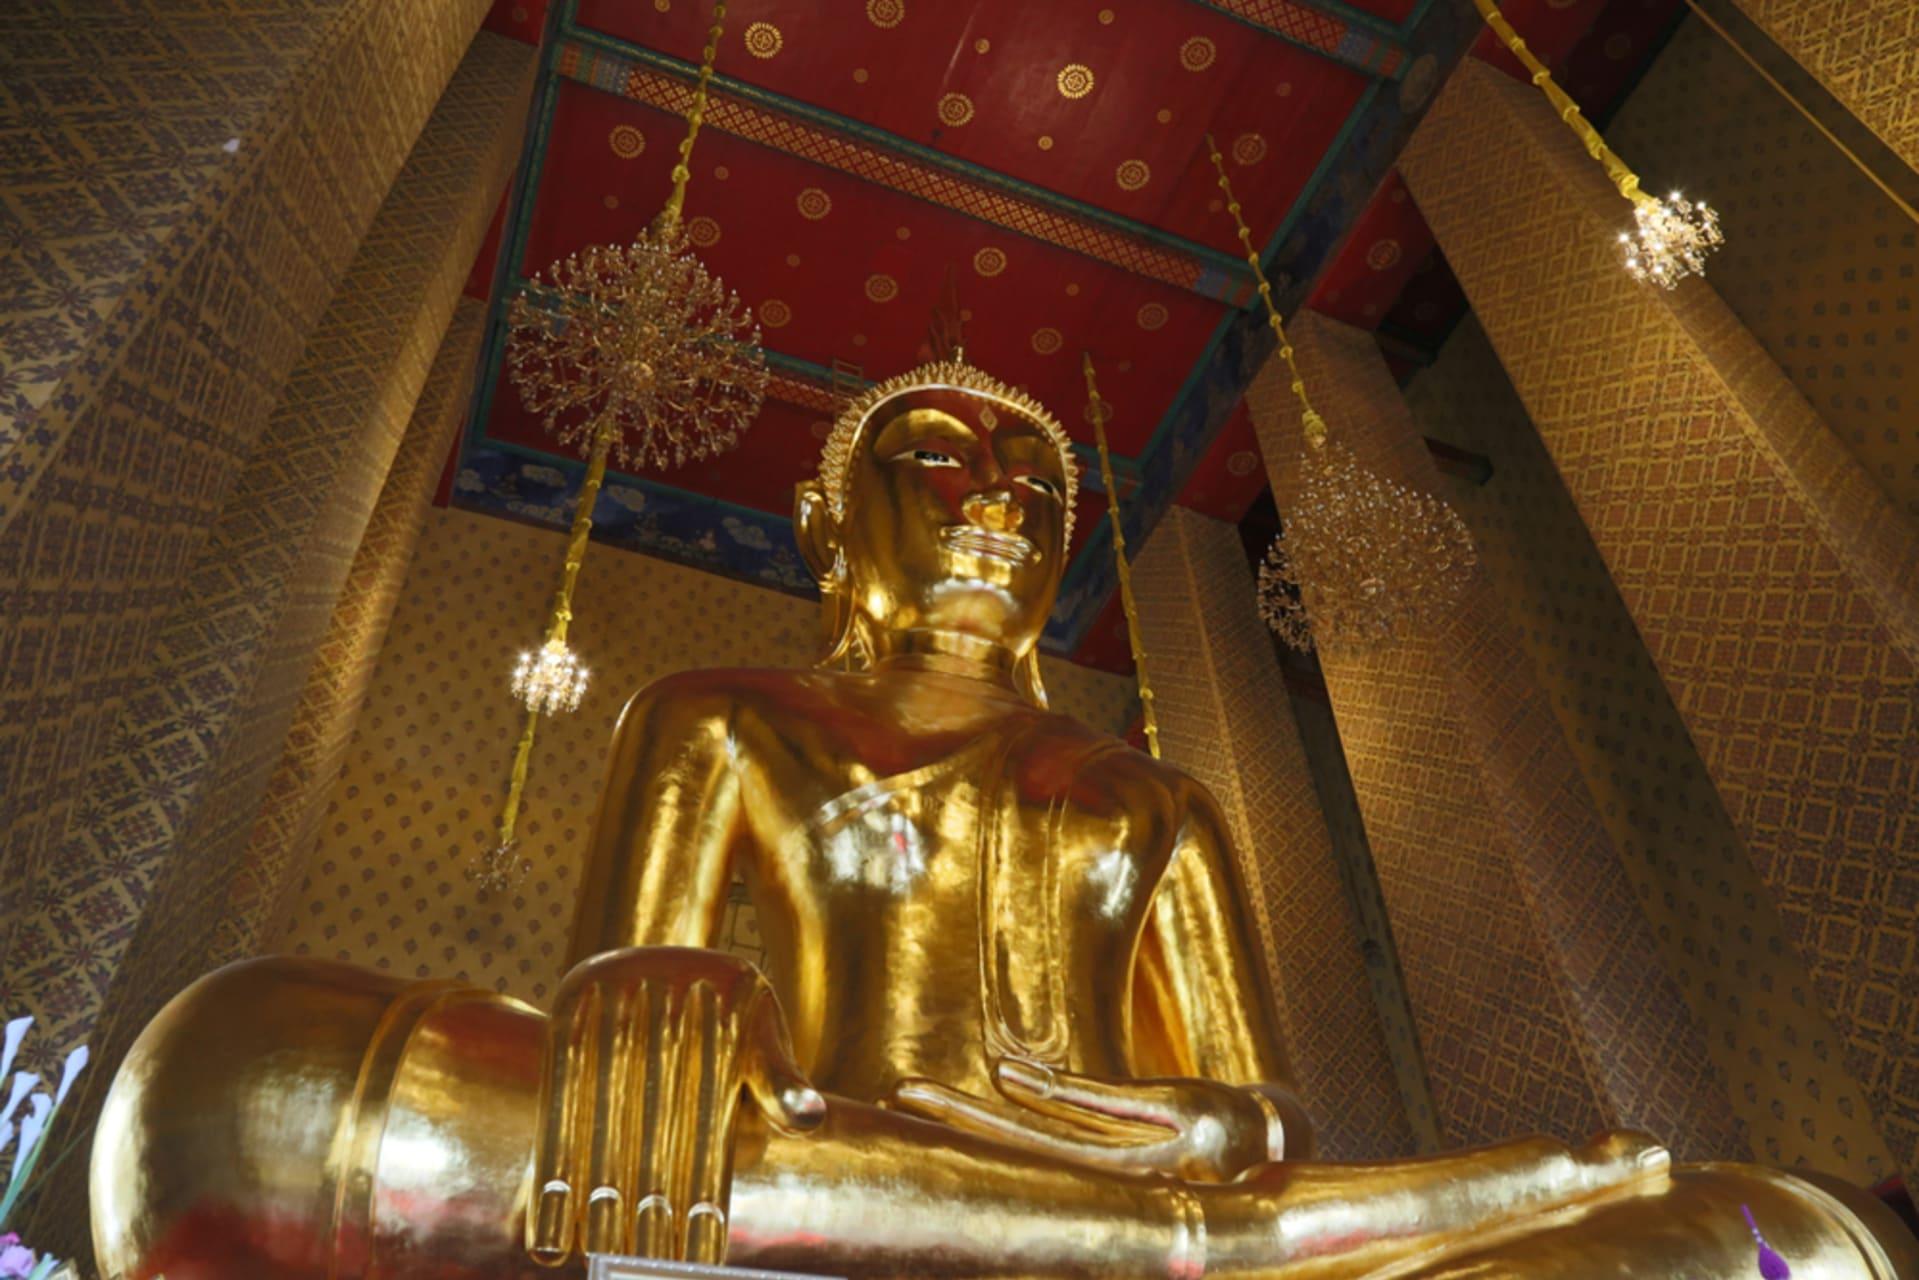 Bangkok - River of the King and Big Buddha inside Wat Kanlaya